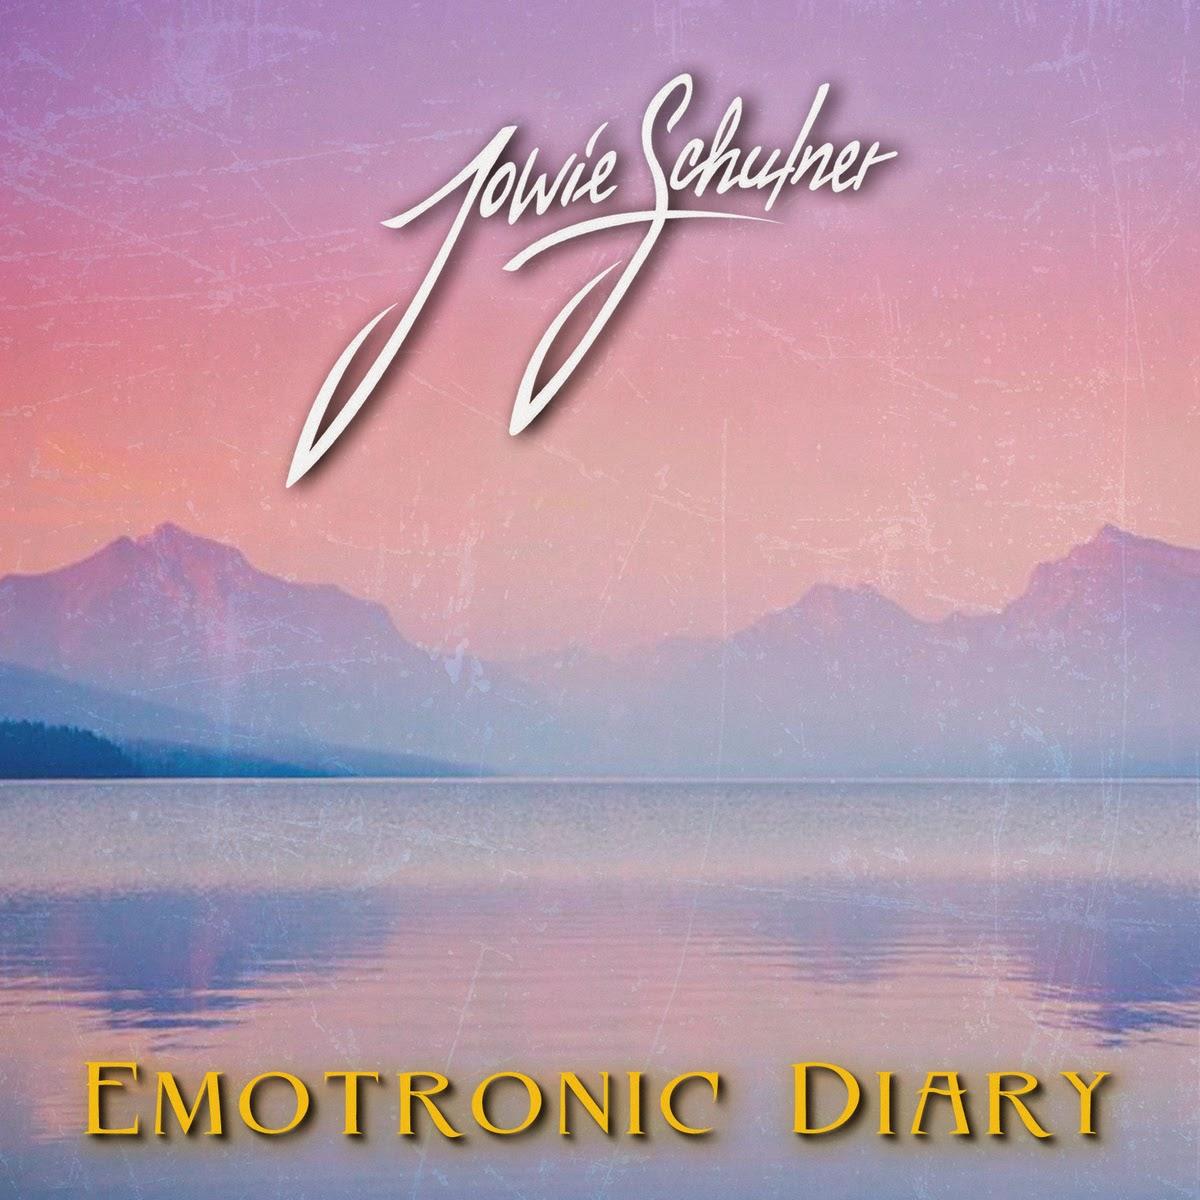 Jowie Schulner - Emotronic Diary